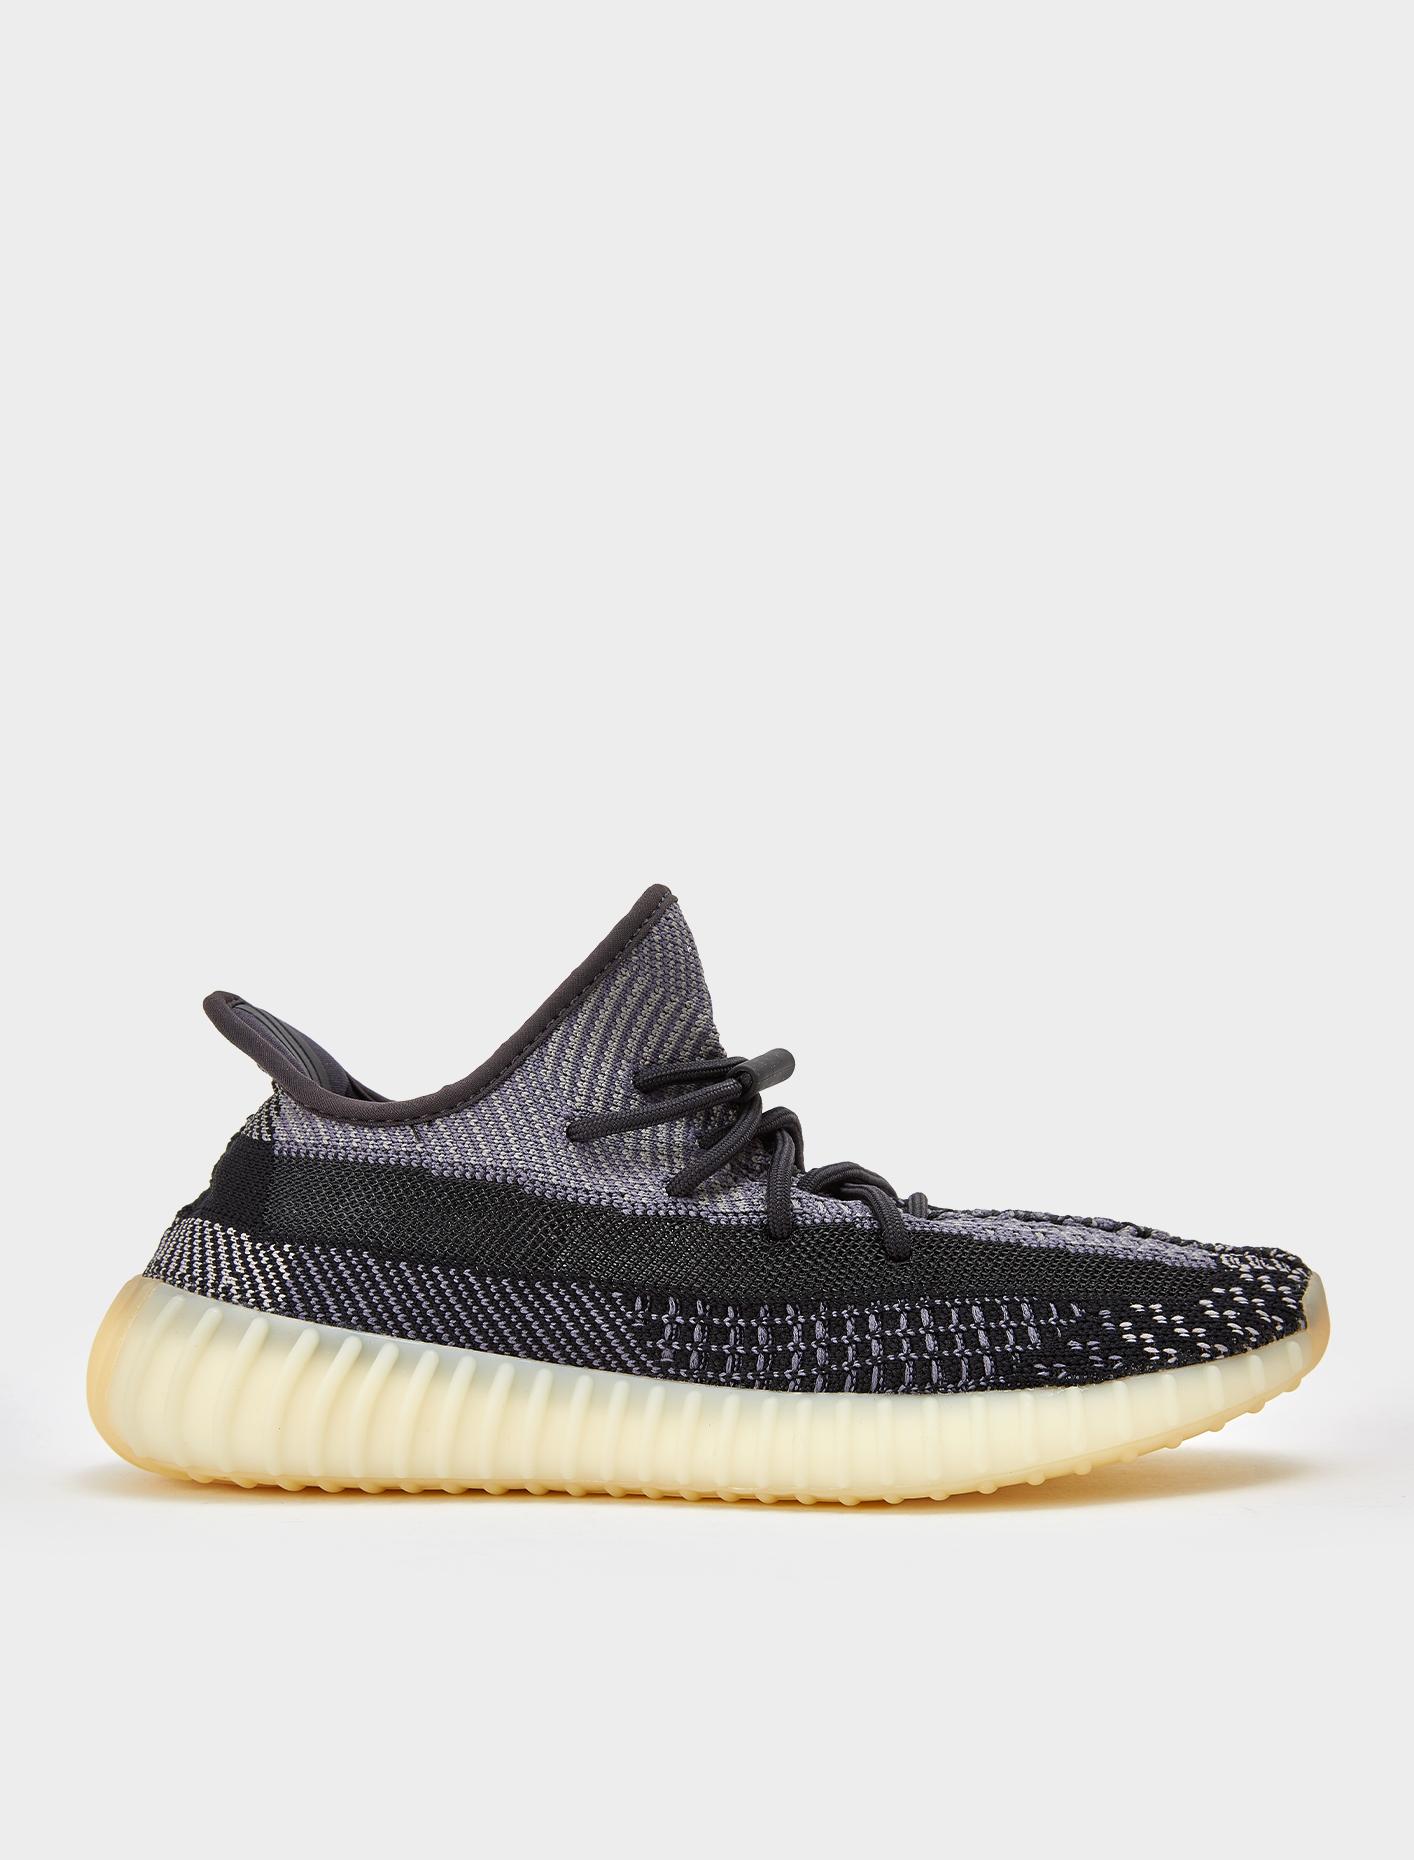 Adidas Yeezy Boost 350 V2 Sneaker in